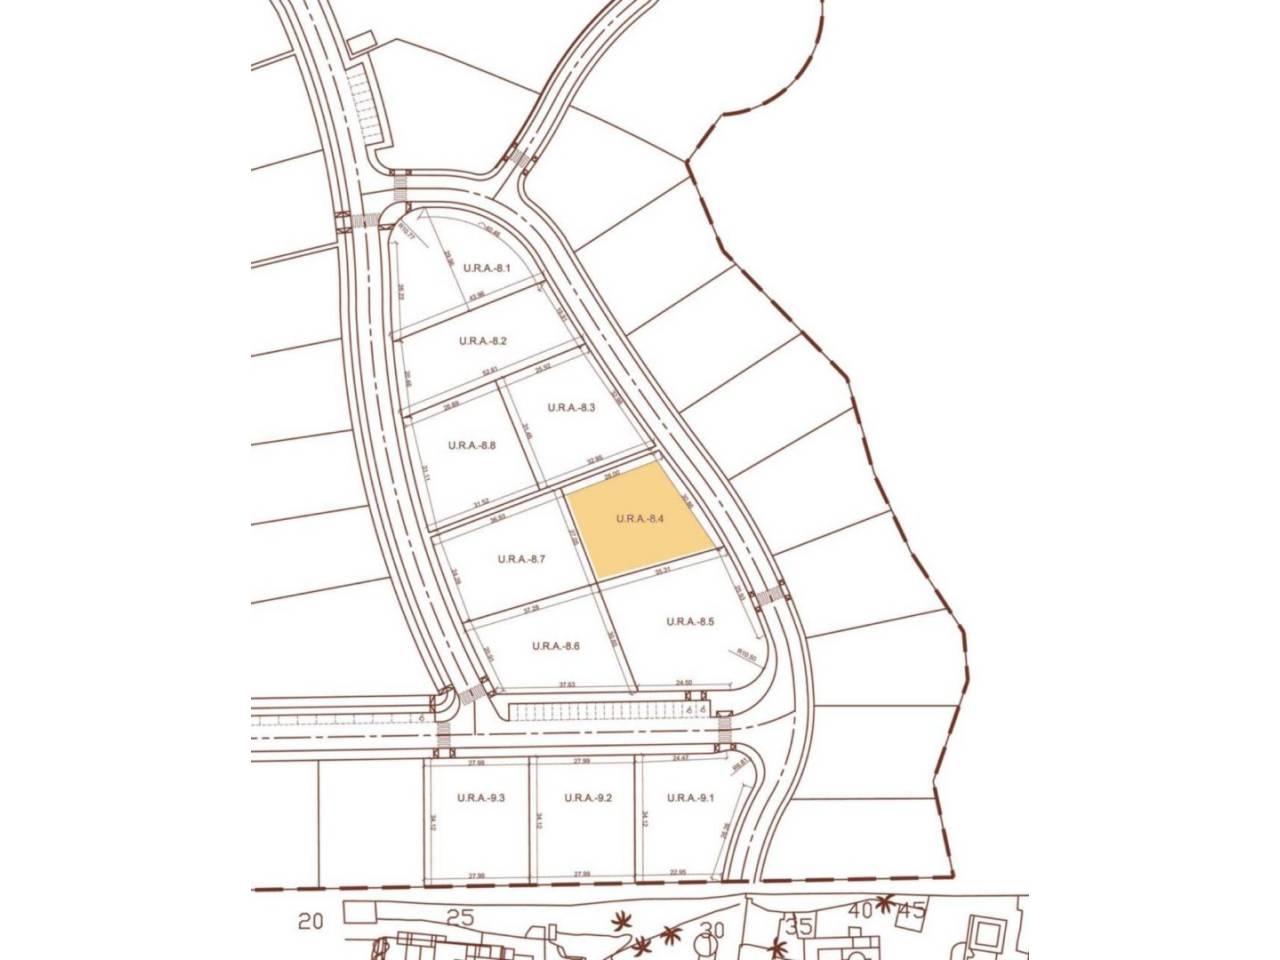 Imagen 4 de Baugrundstück für Einfamilienhäuser mit Meerblick